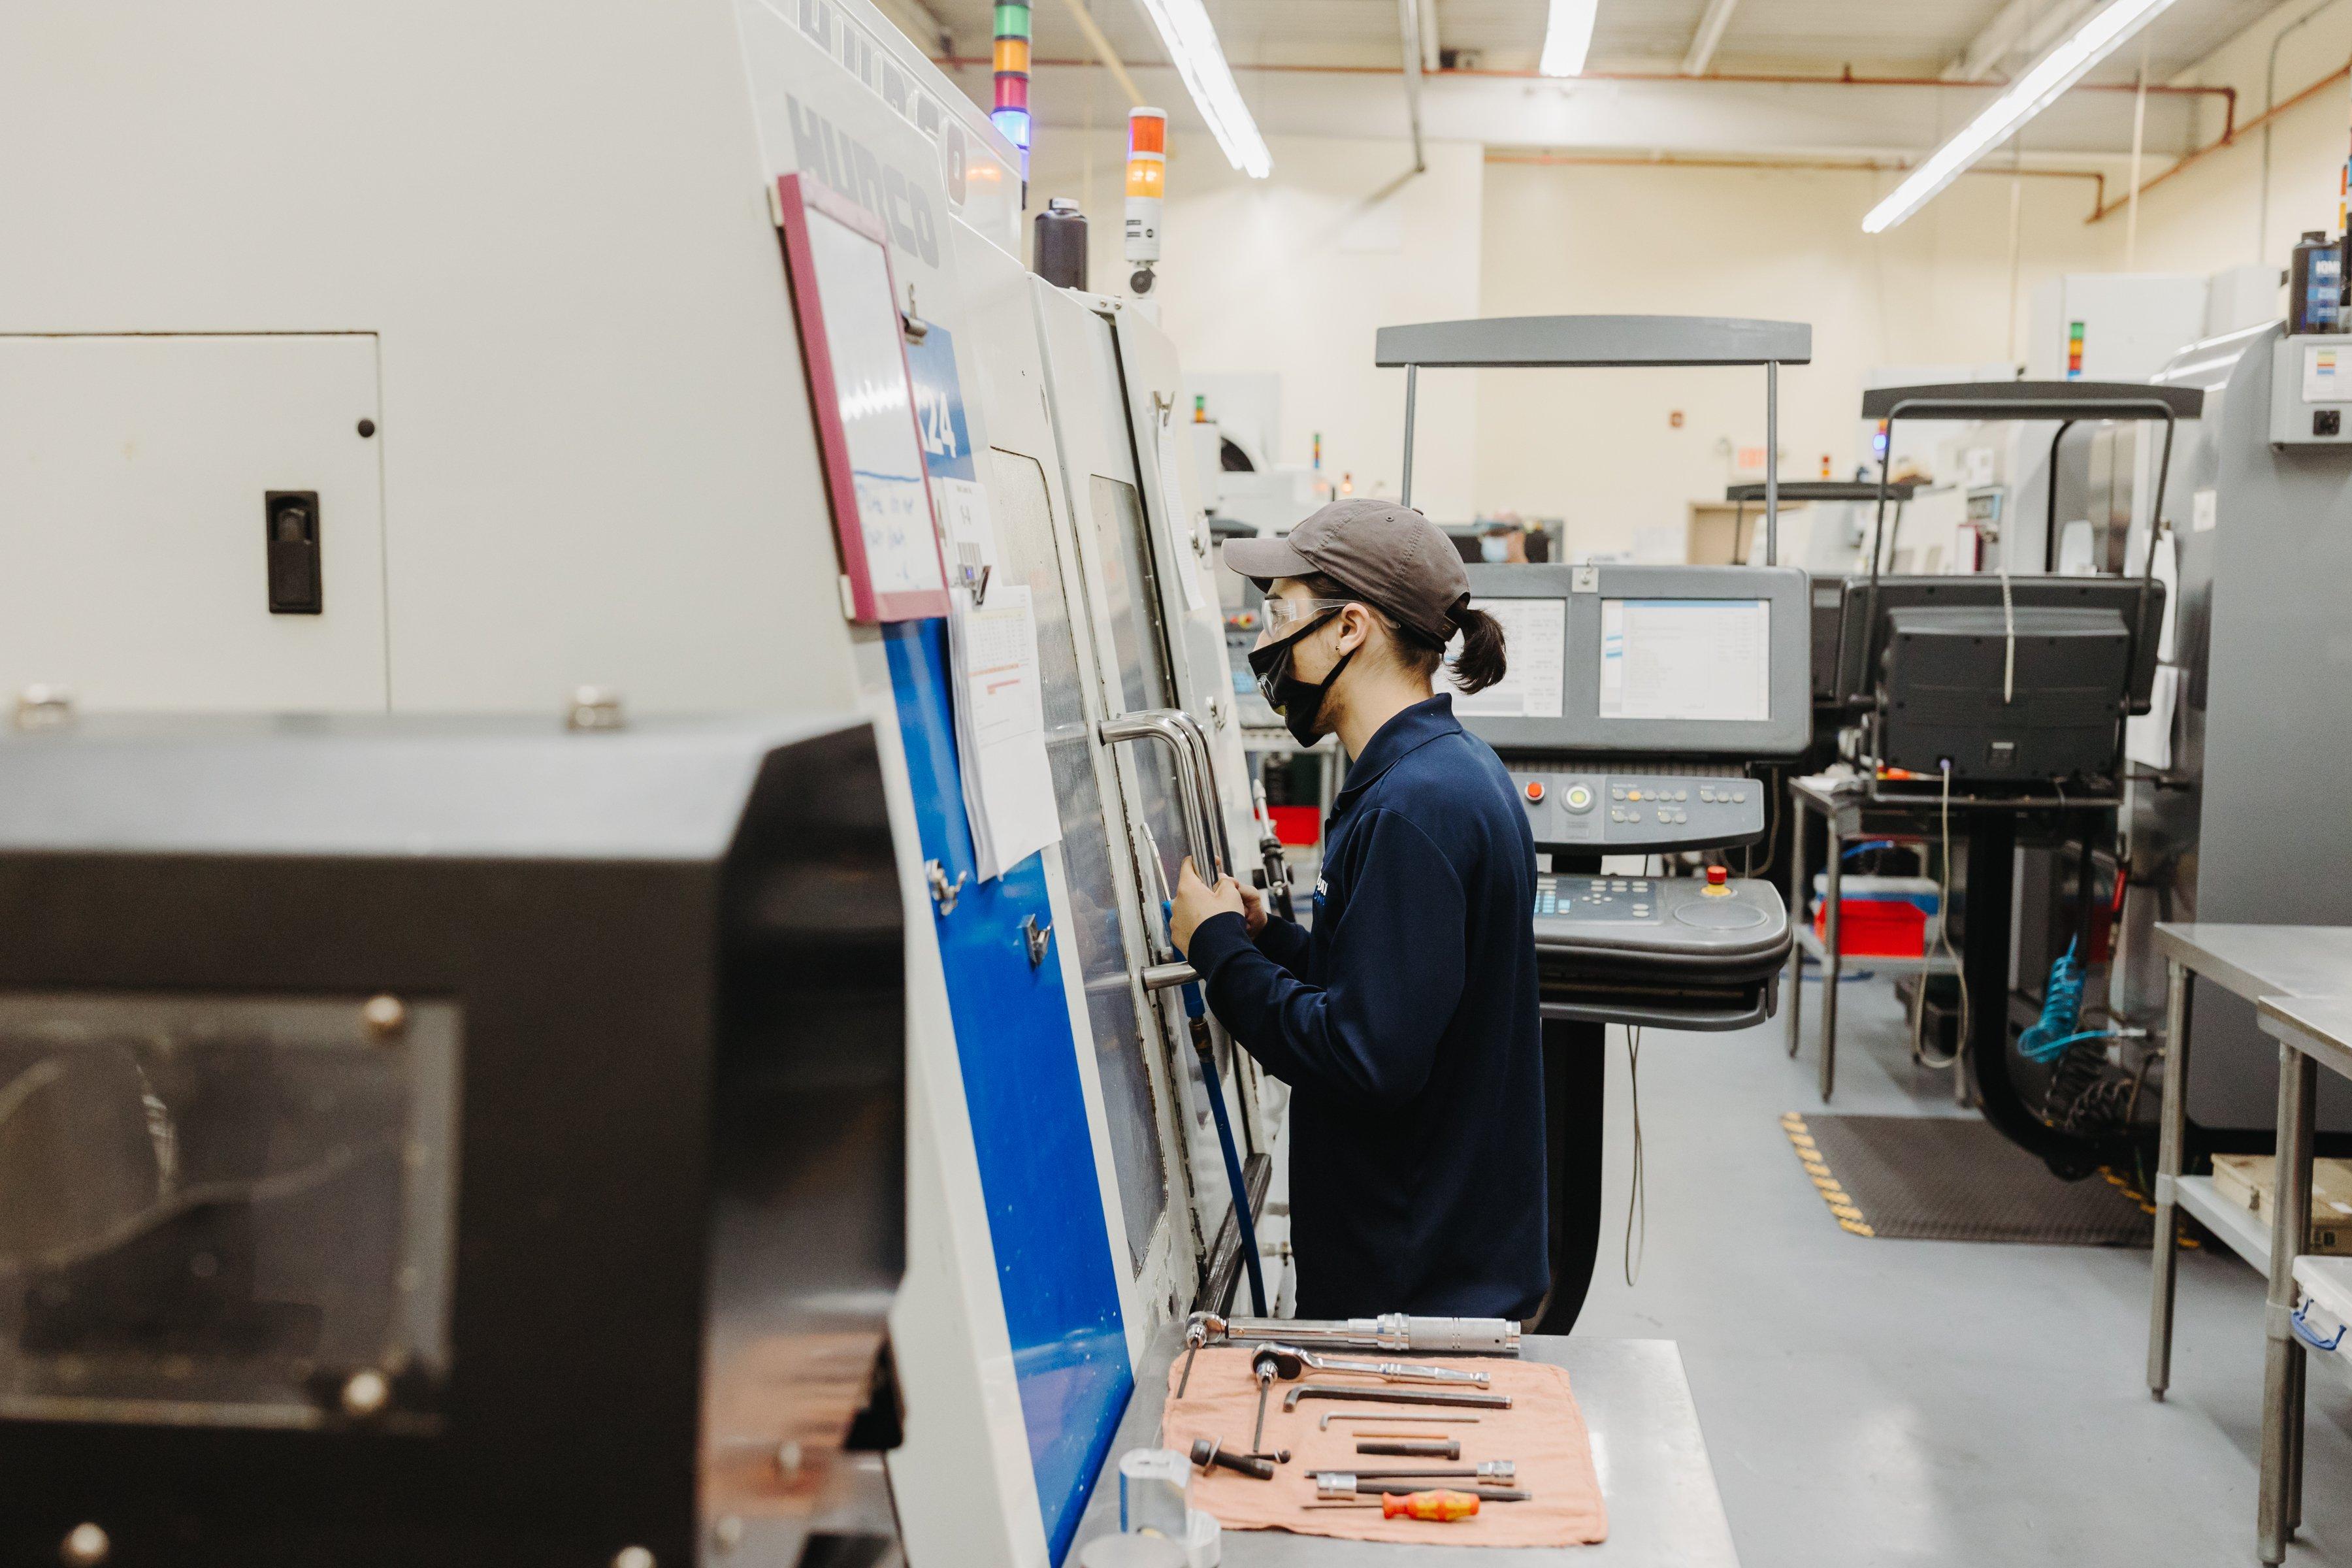 A man looks inside a CNC machine